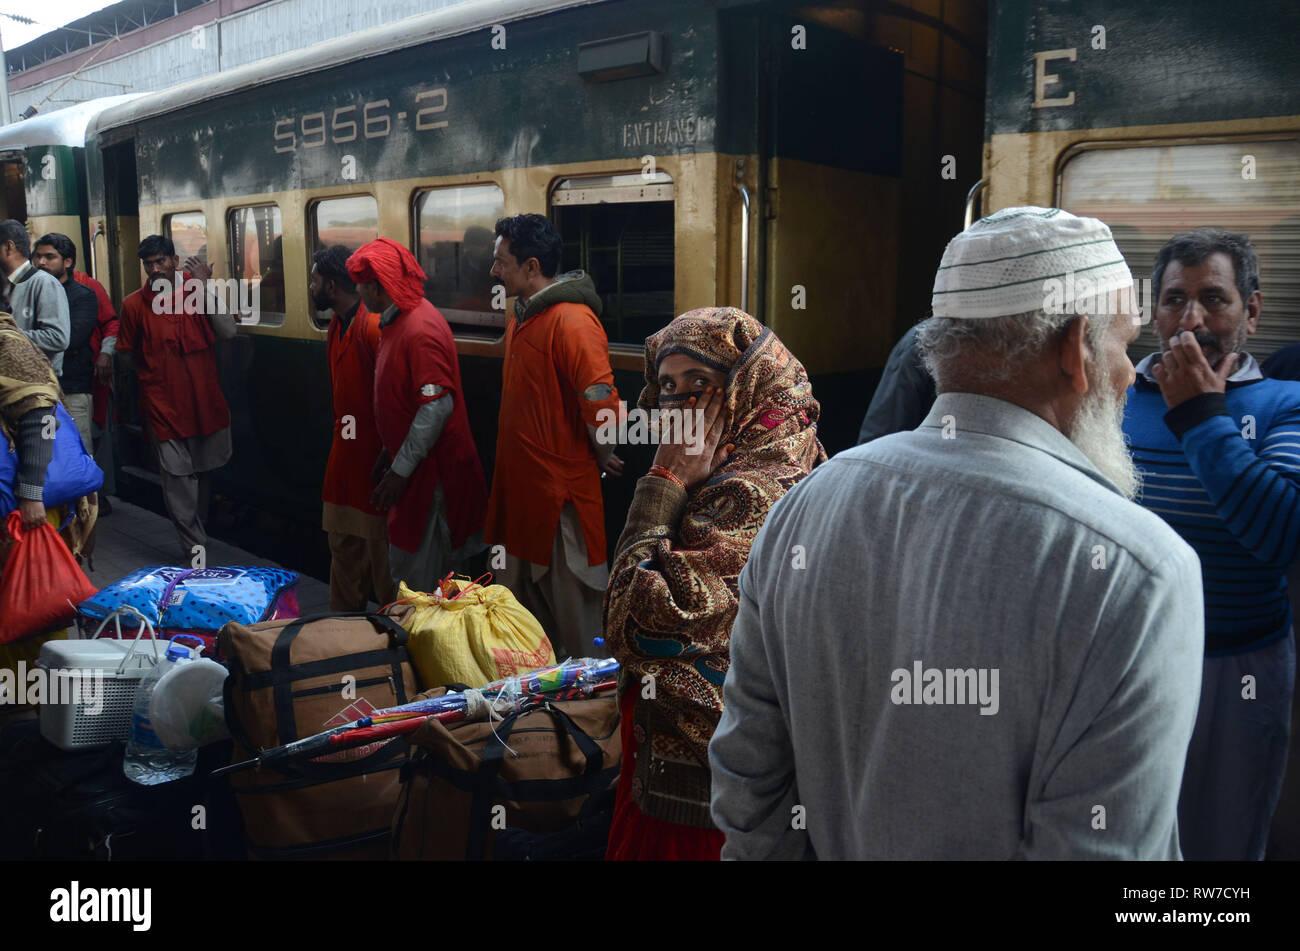 Lahore, Pakistan  04th Mar, 2019  Amid tension between